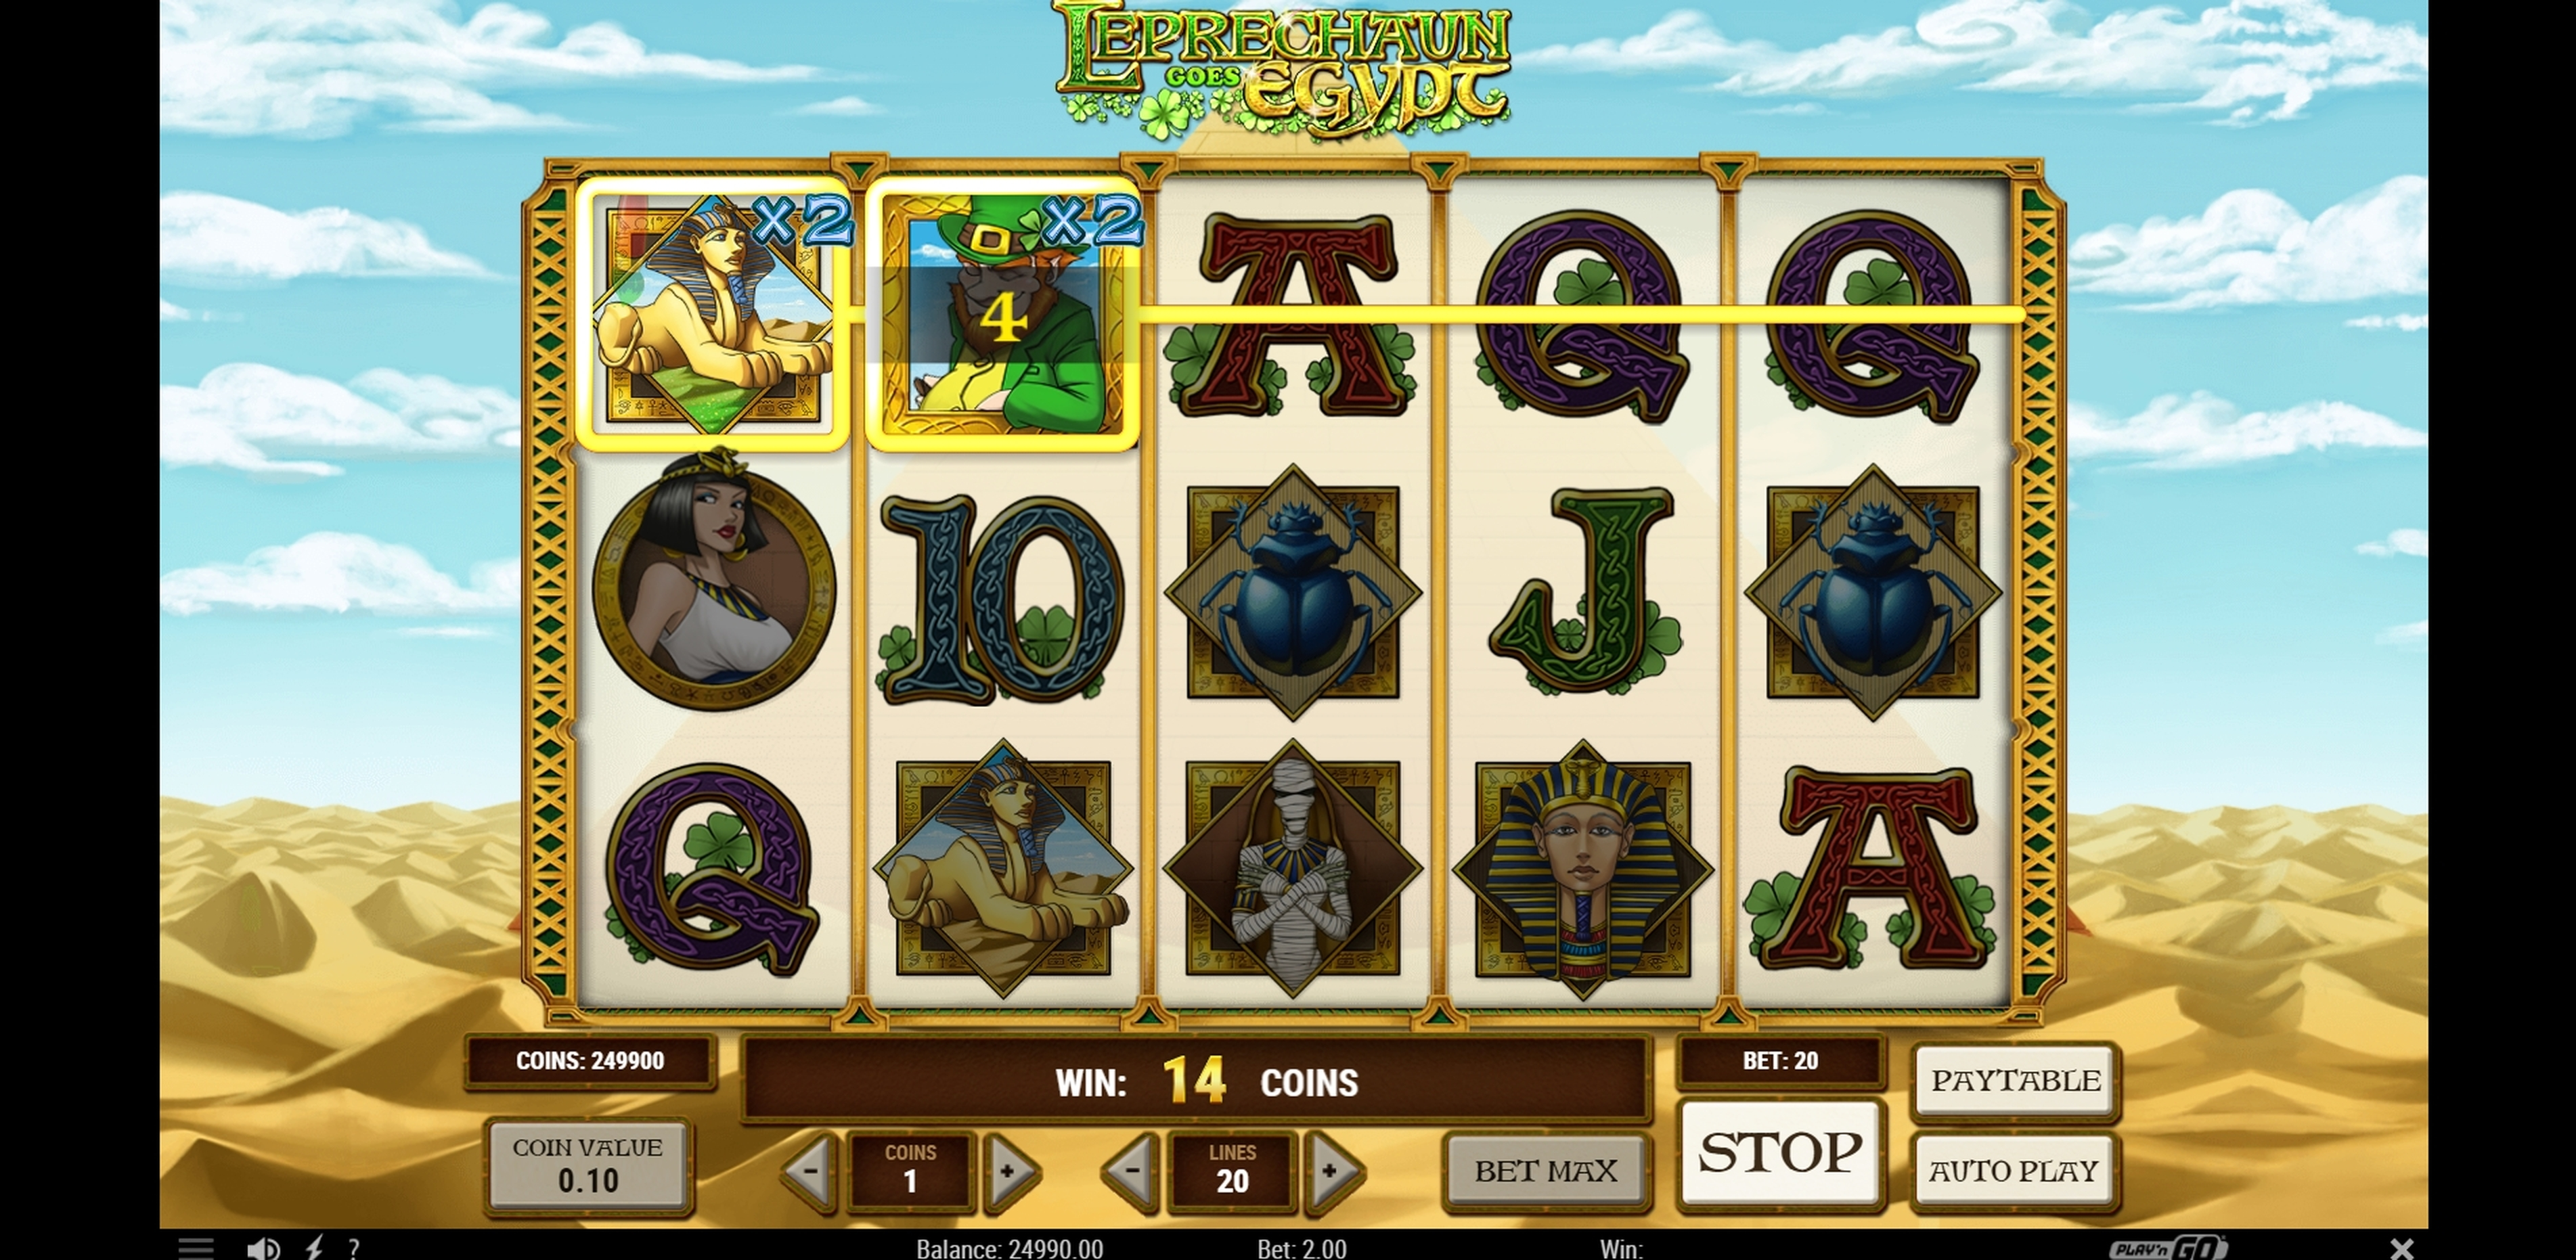 Leprechaun Goes Egypt Slot Machine Online By Play N Go Review Free Demo Play Casinosanalyzer Com